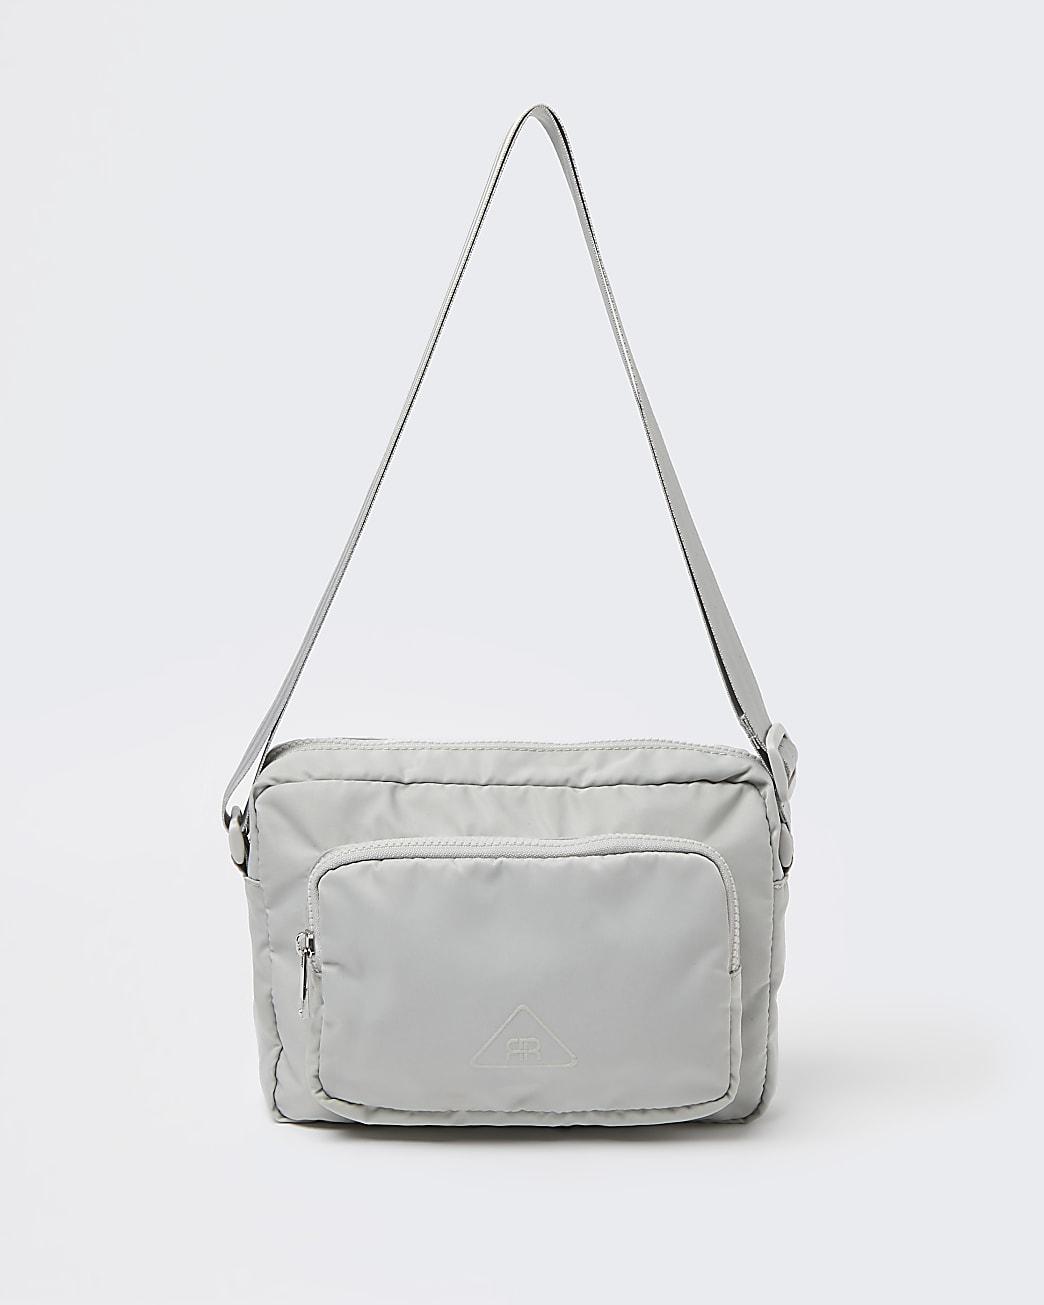 Grey nylon front pocket cross body bag